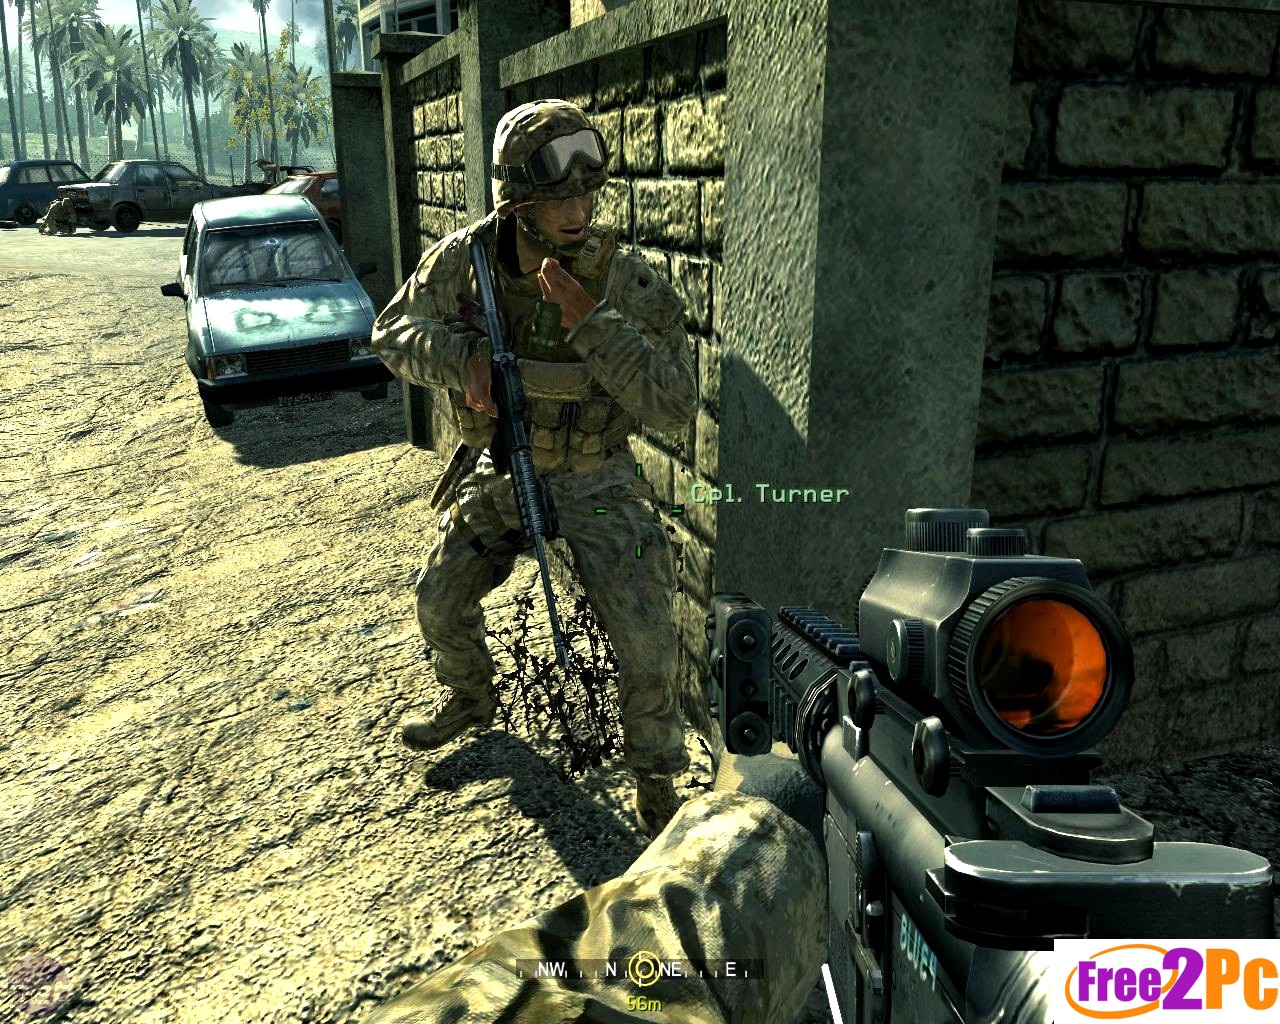 Call-of-Duty-4-Modern-Warfare-Download-www-free2pc-com